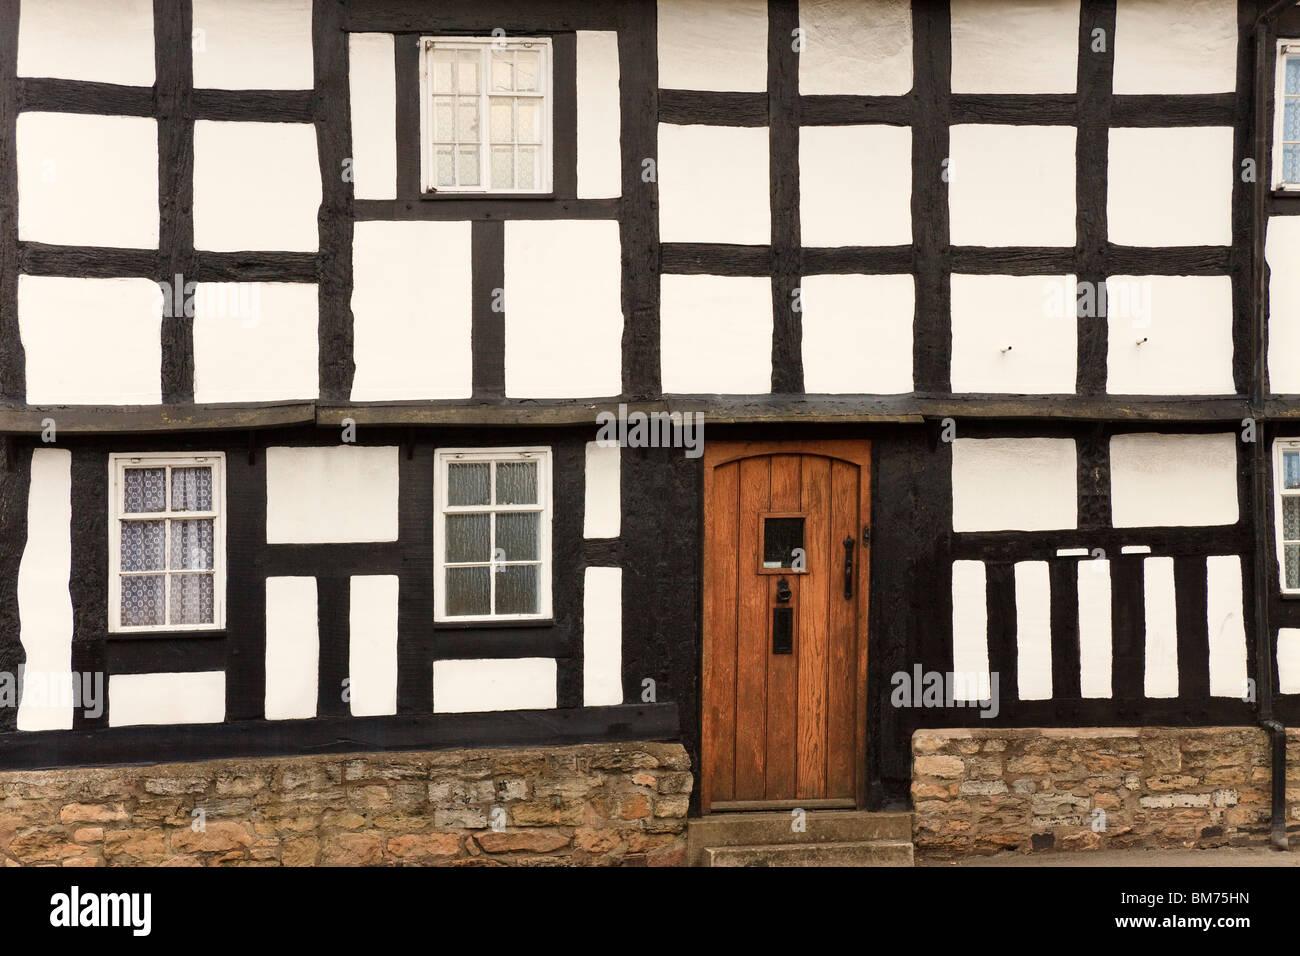 UK Pershore Wood Framed House - Stock Image